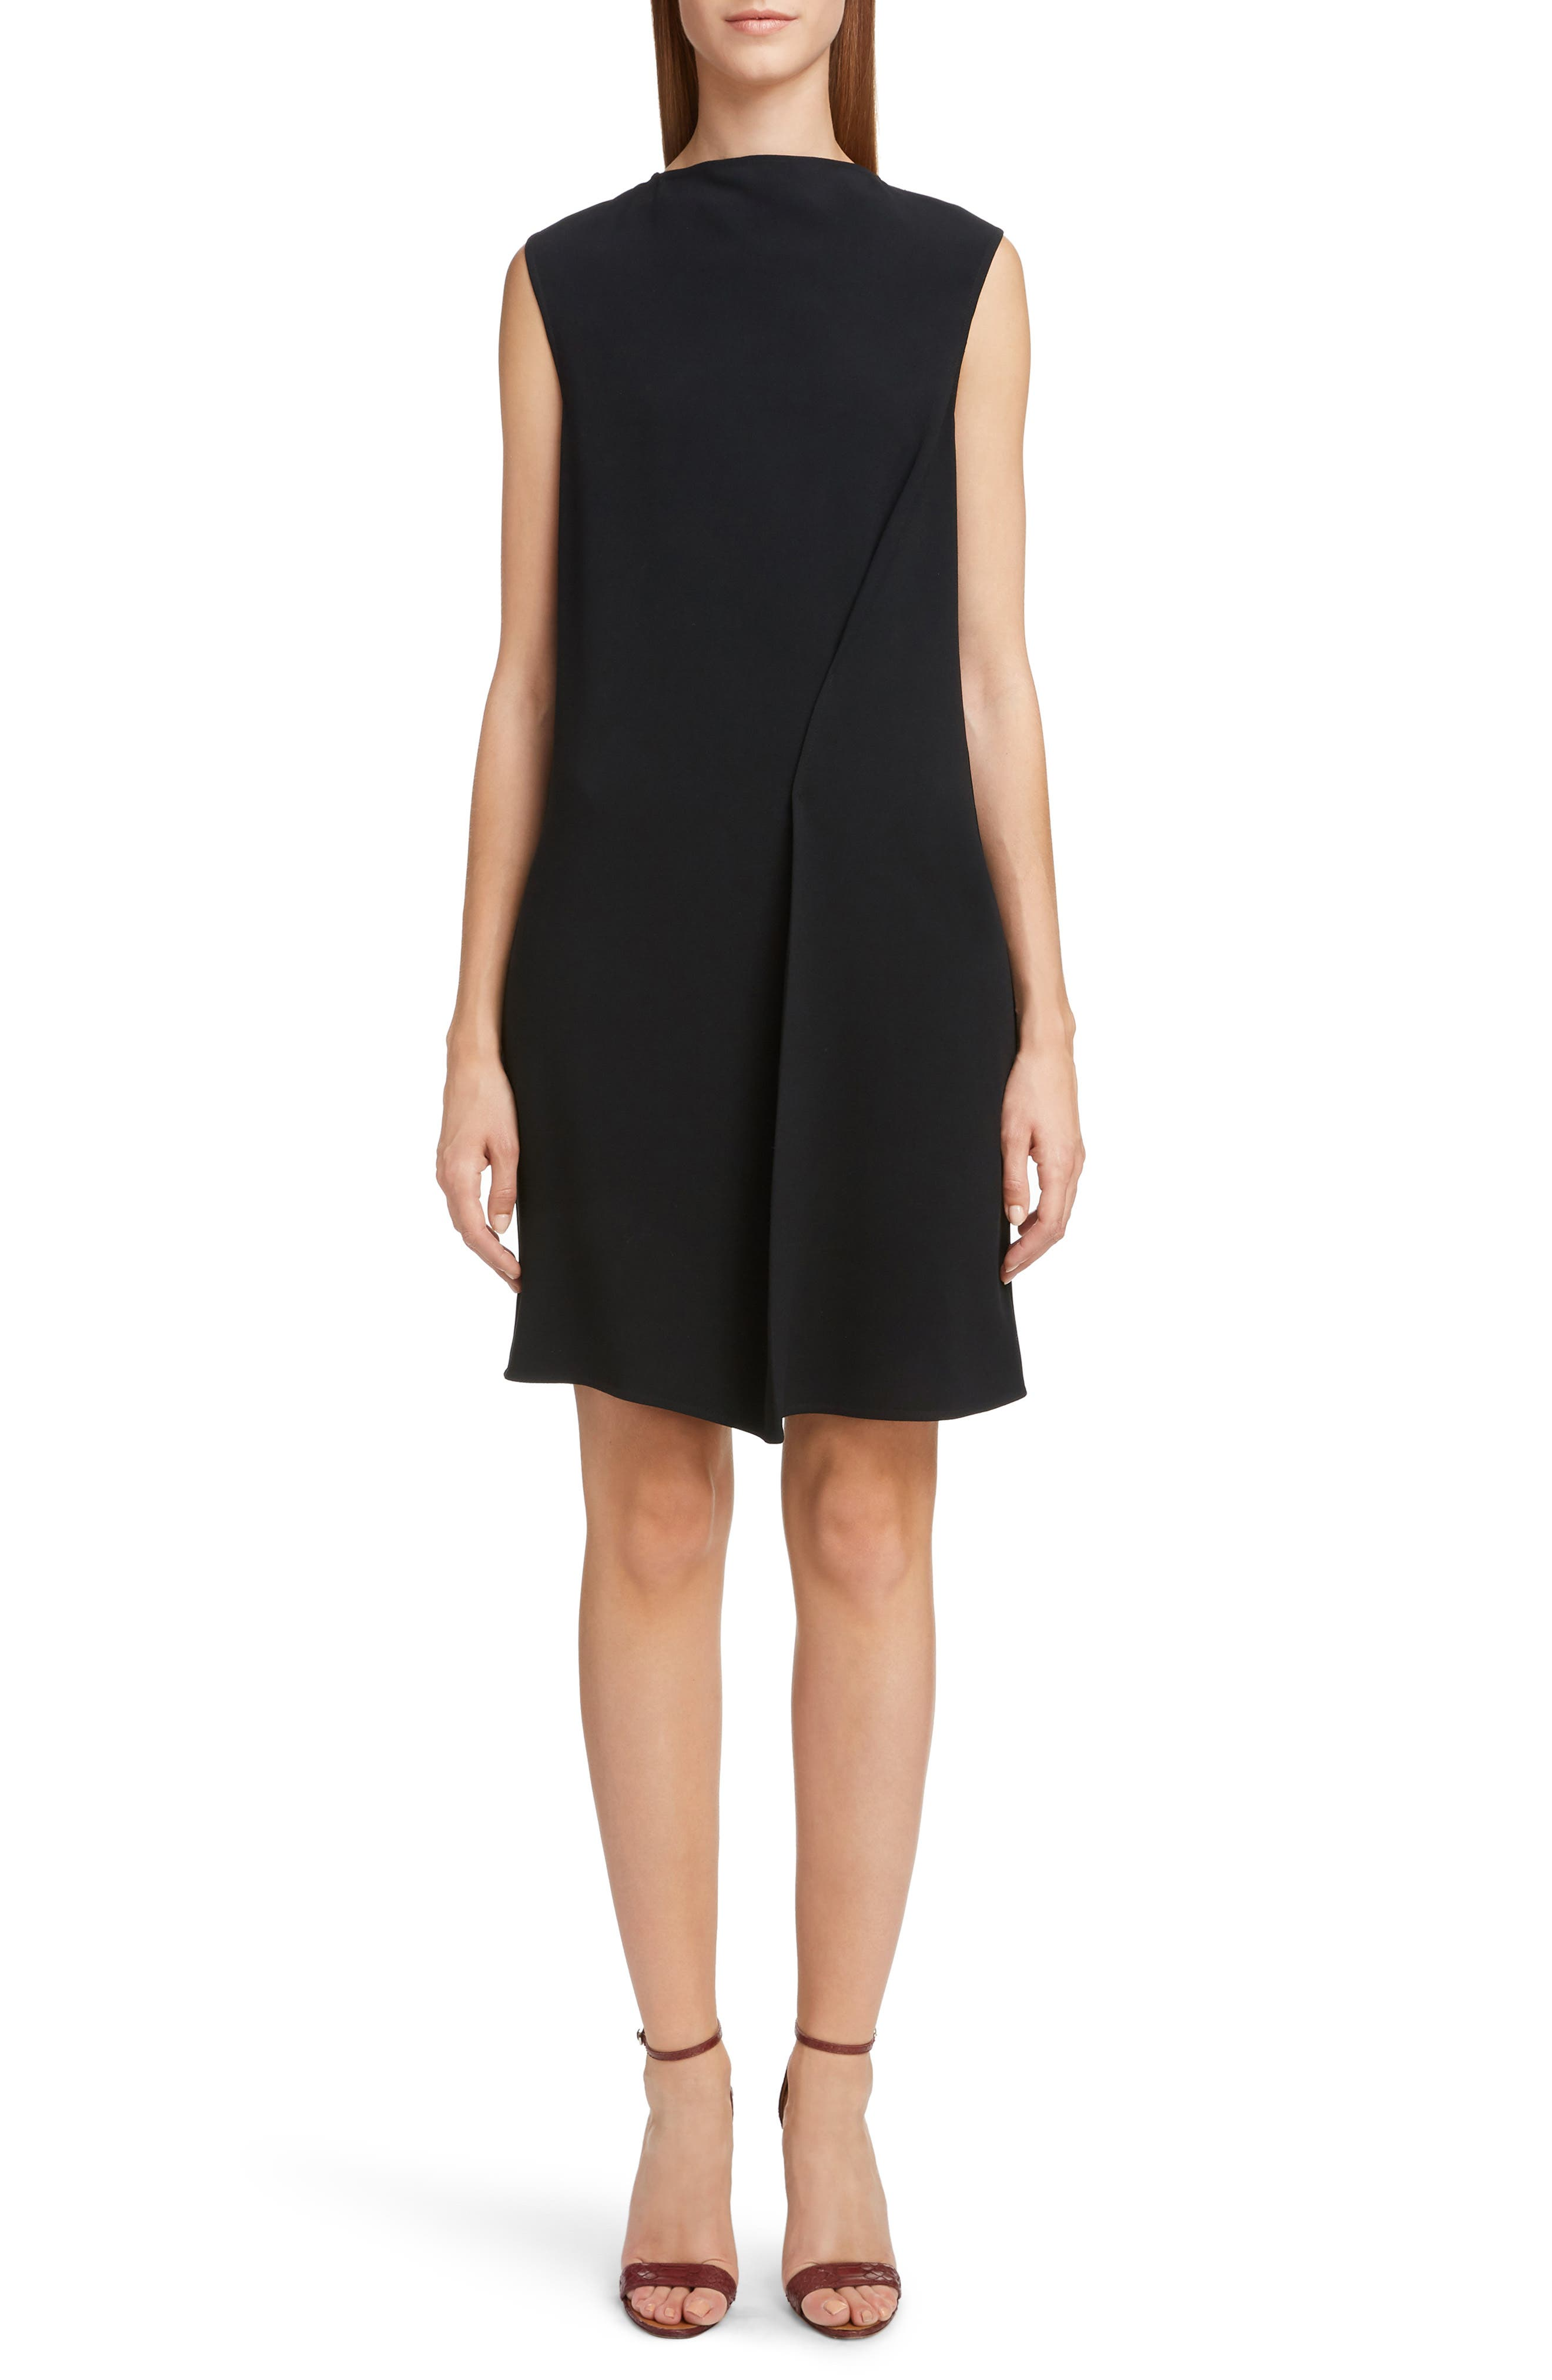 VICTORIA BECKHAM, Asymmetrical Pleat Shift Dress, Main thumbnail 1, color, BLACK